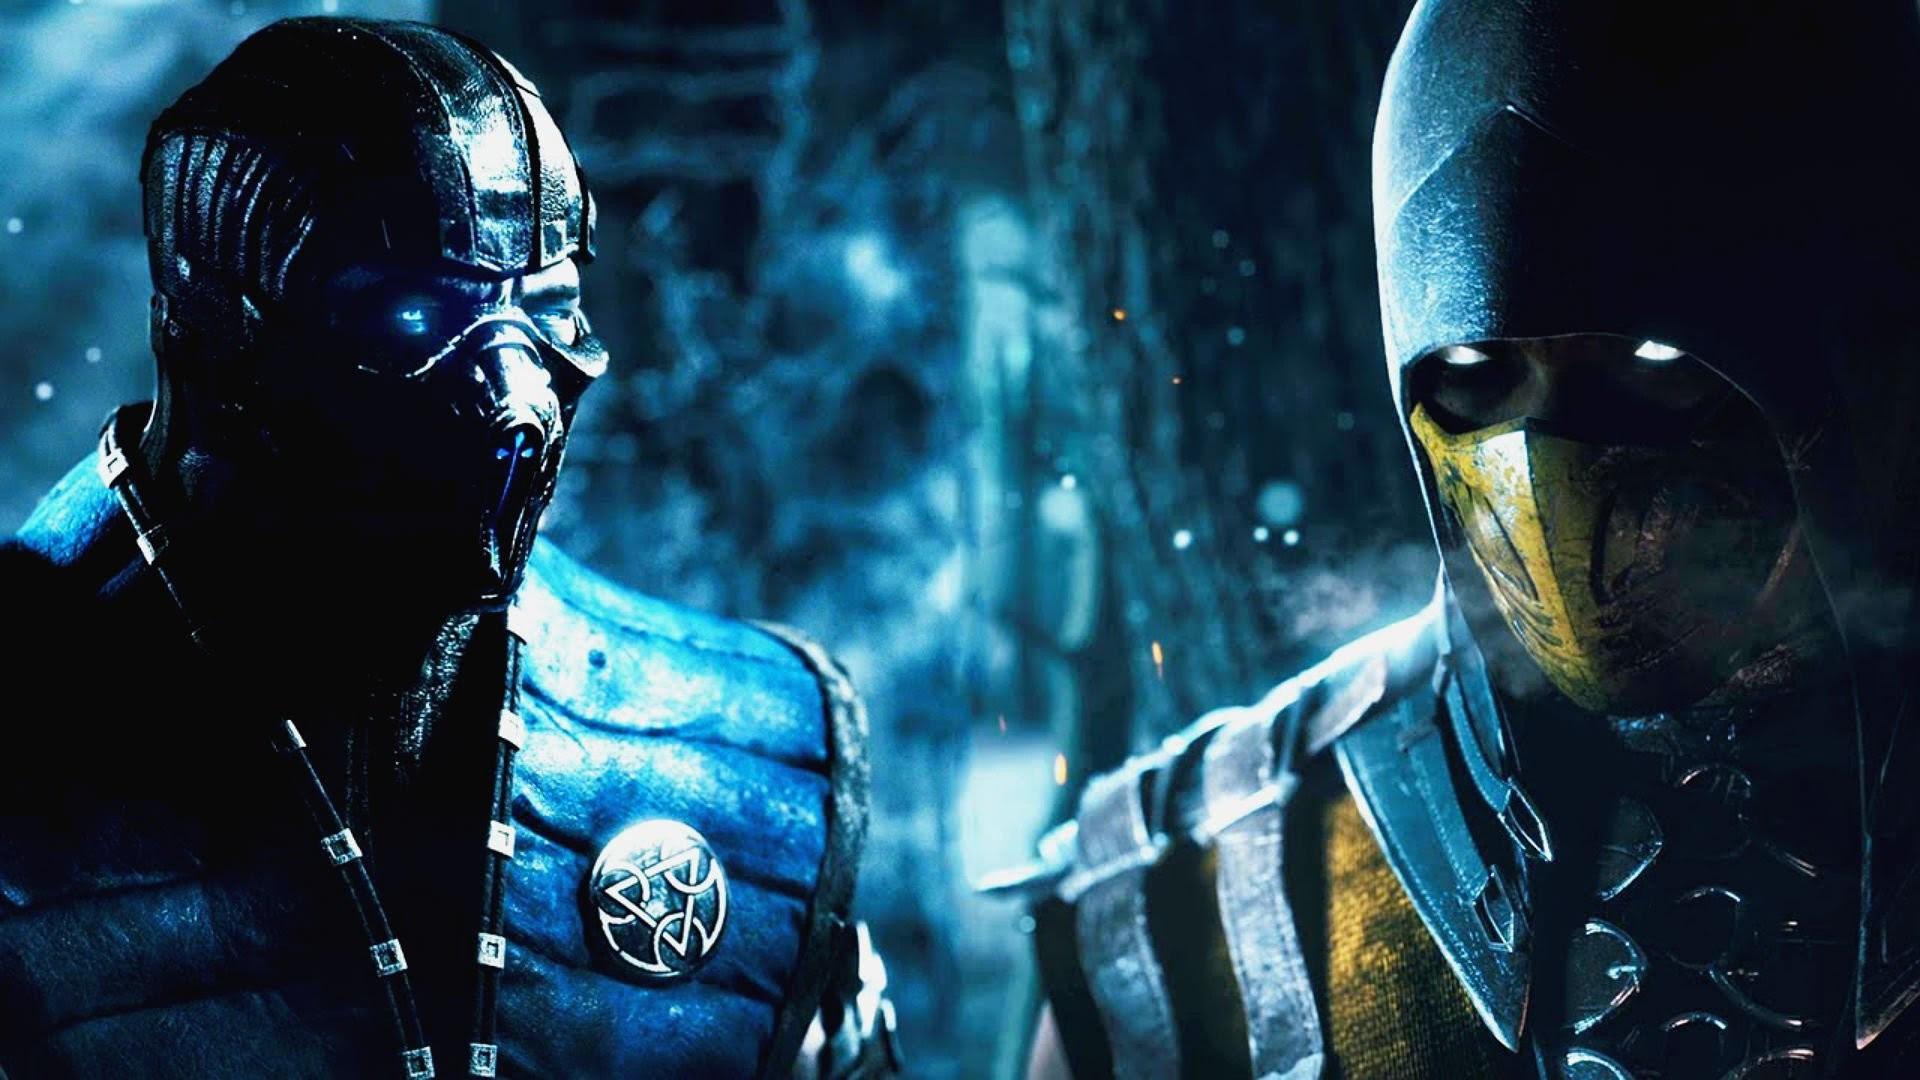 Mortal Kombat X Wallpaper 1080p 83 Images